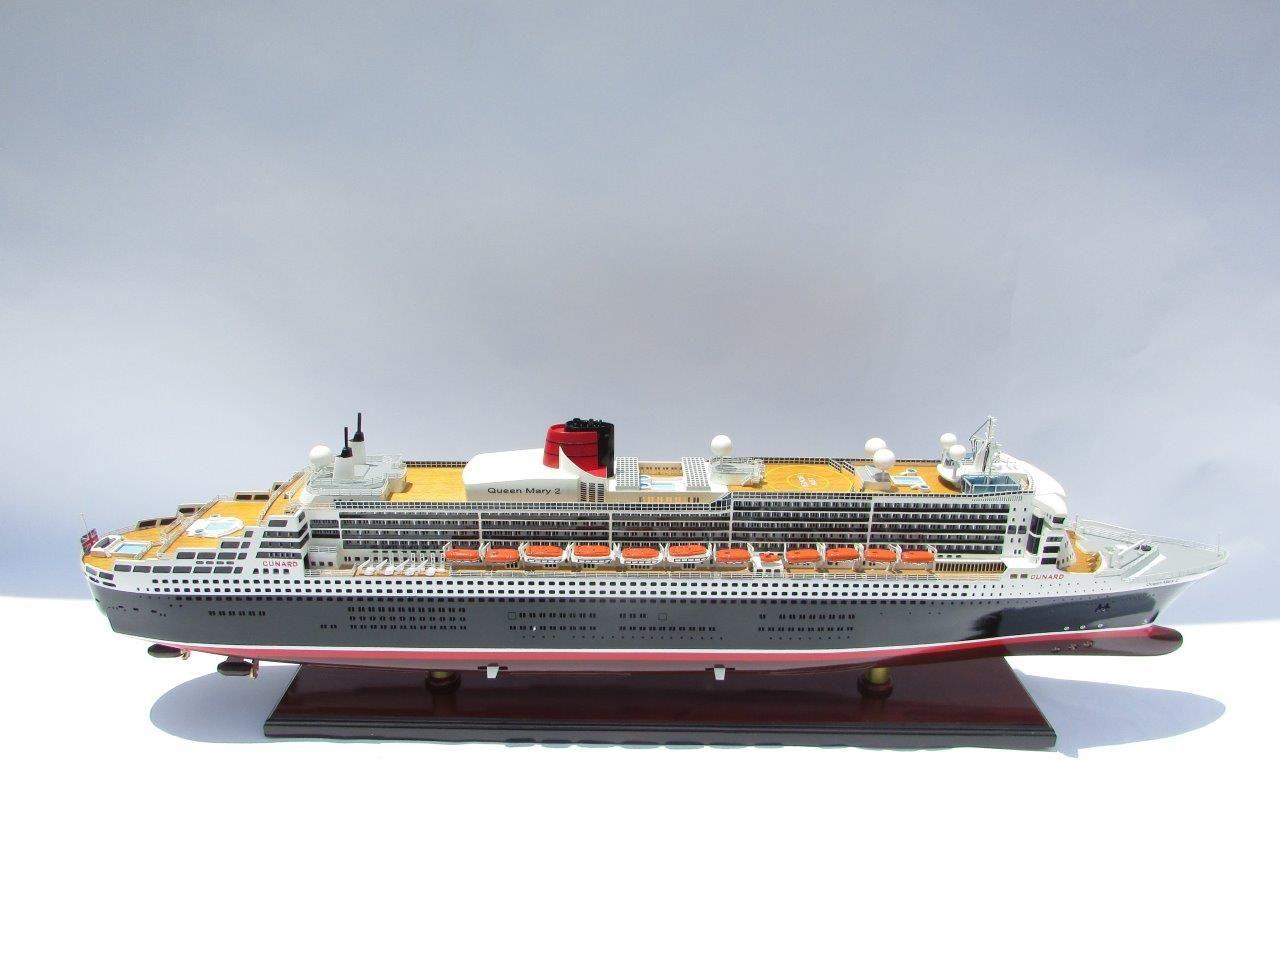 Queen Mary 2 Wooden Model Ship - GN (CS0001P-80)